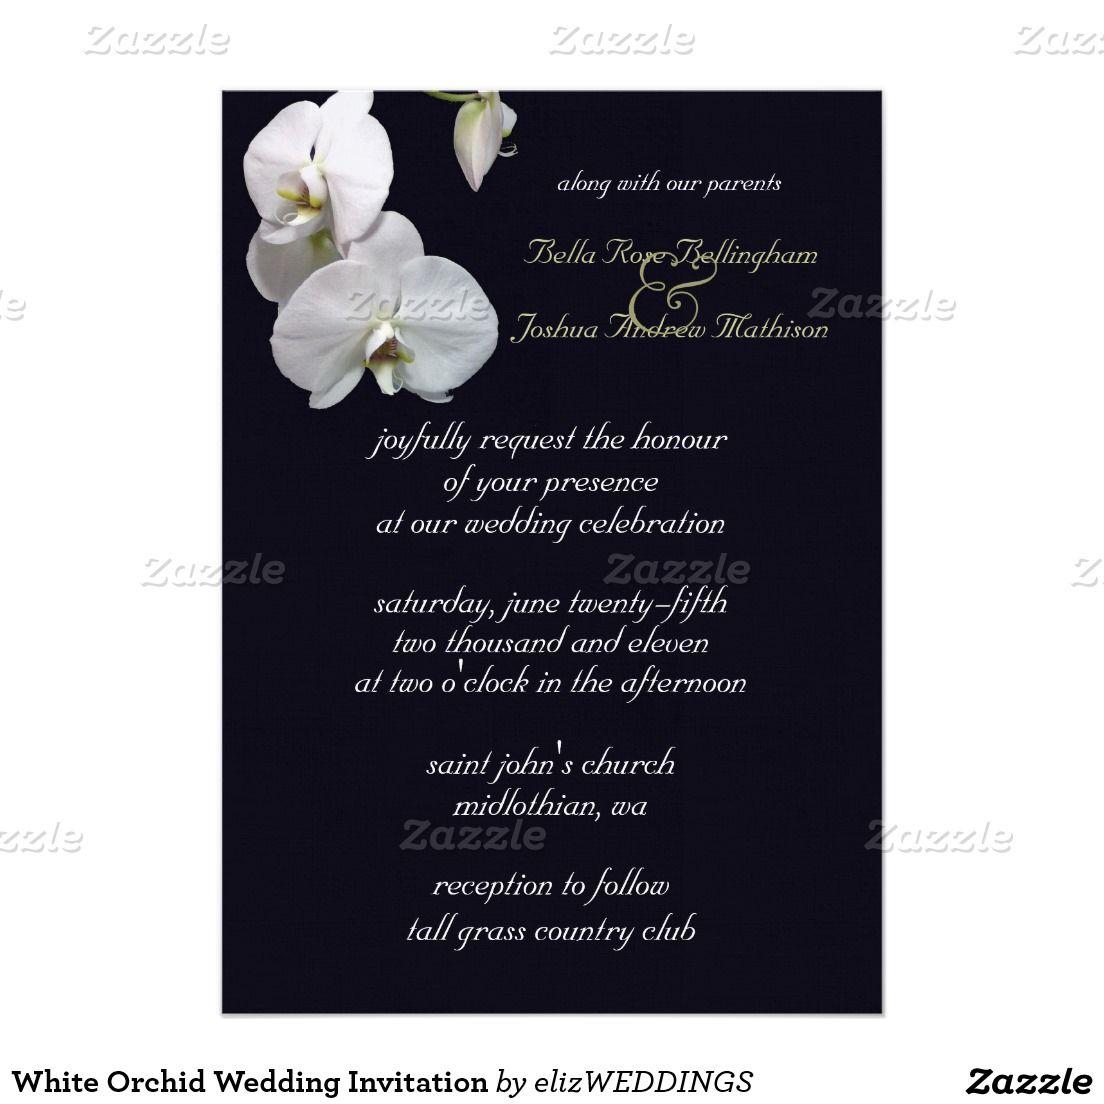 Wedding Officiant Speech Ideas: White Orchid Wedding Invitation